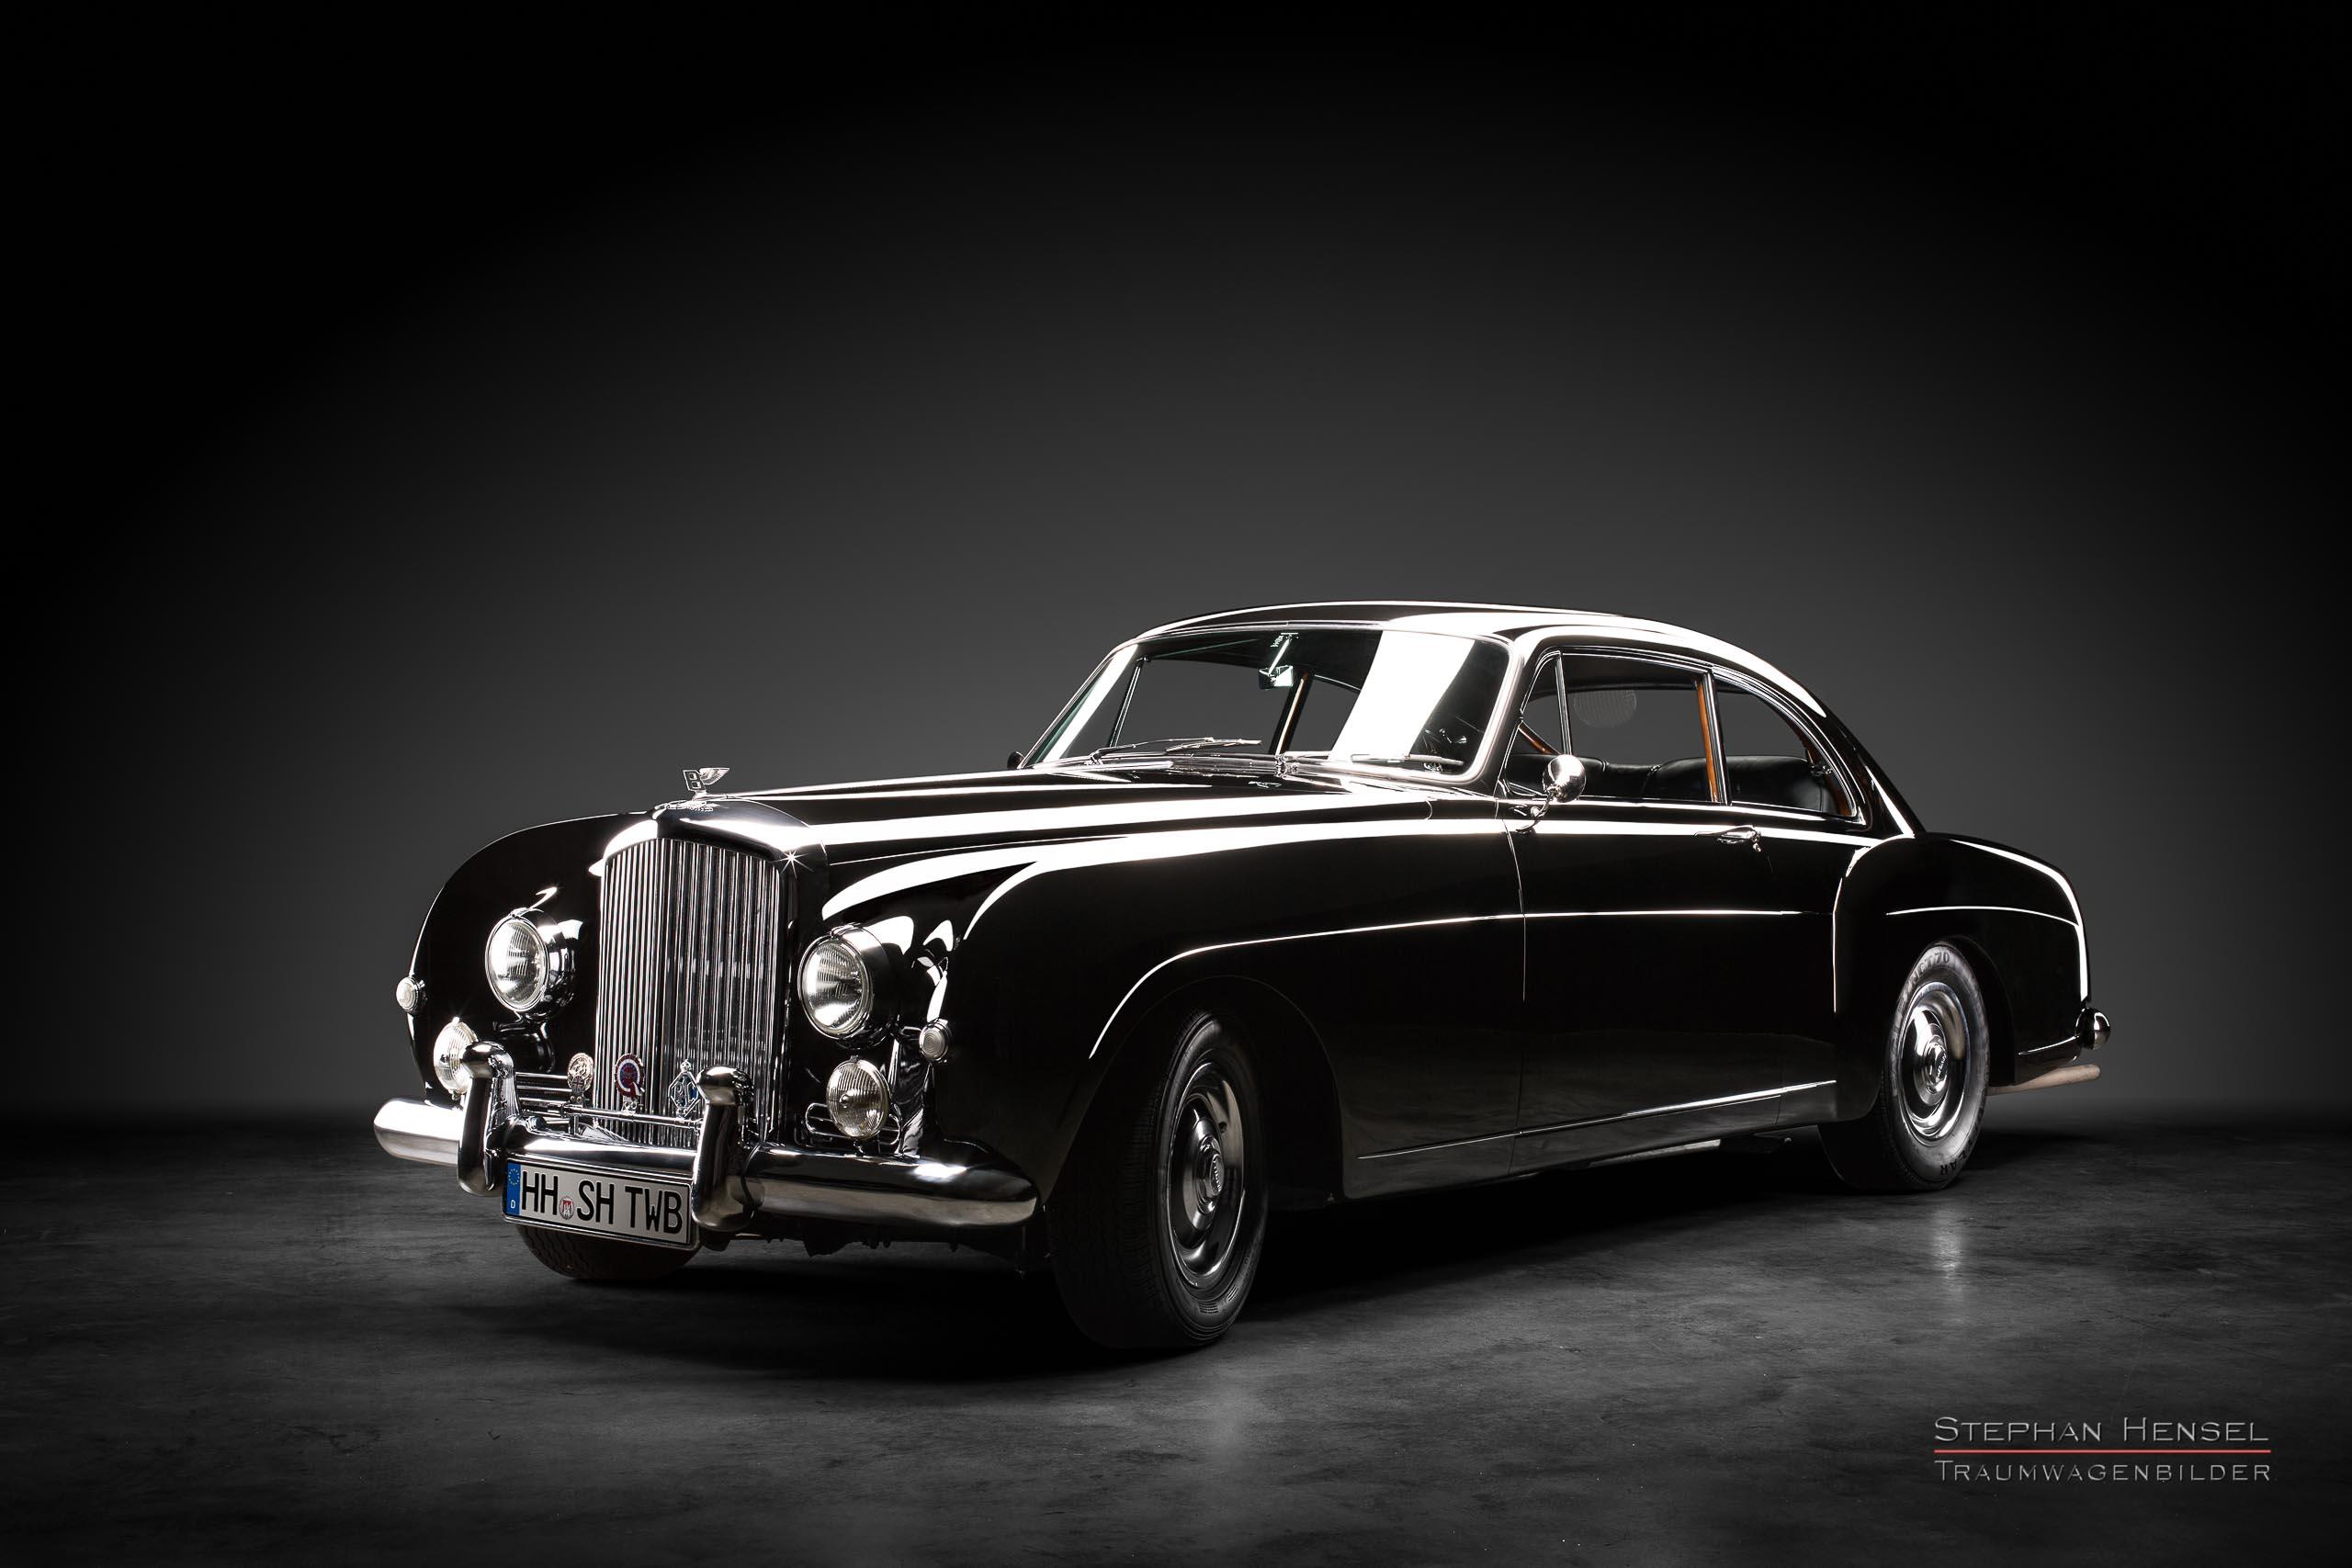 Bentley S1 Continental, 1956, Frontalansicht, Autofotograf, Hamburg, Automobilfotograf, Oldtimerfotograf, Oldtimerfotografie, Car Photography, Stephan Hensel